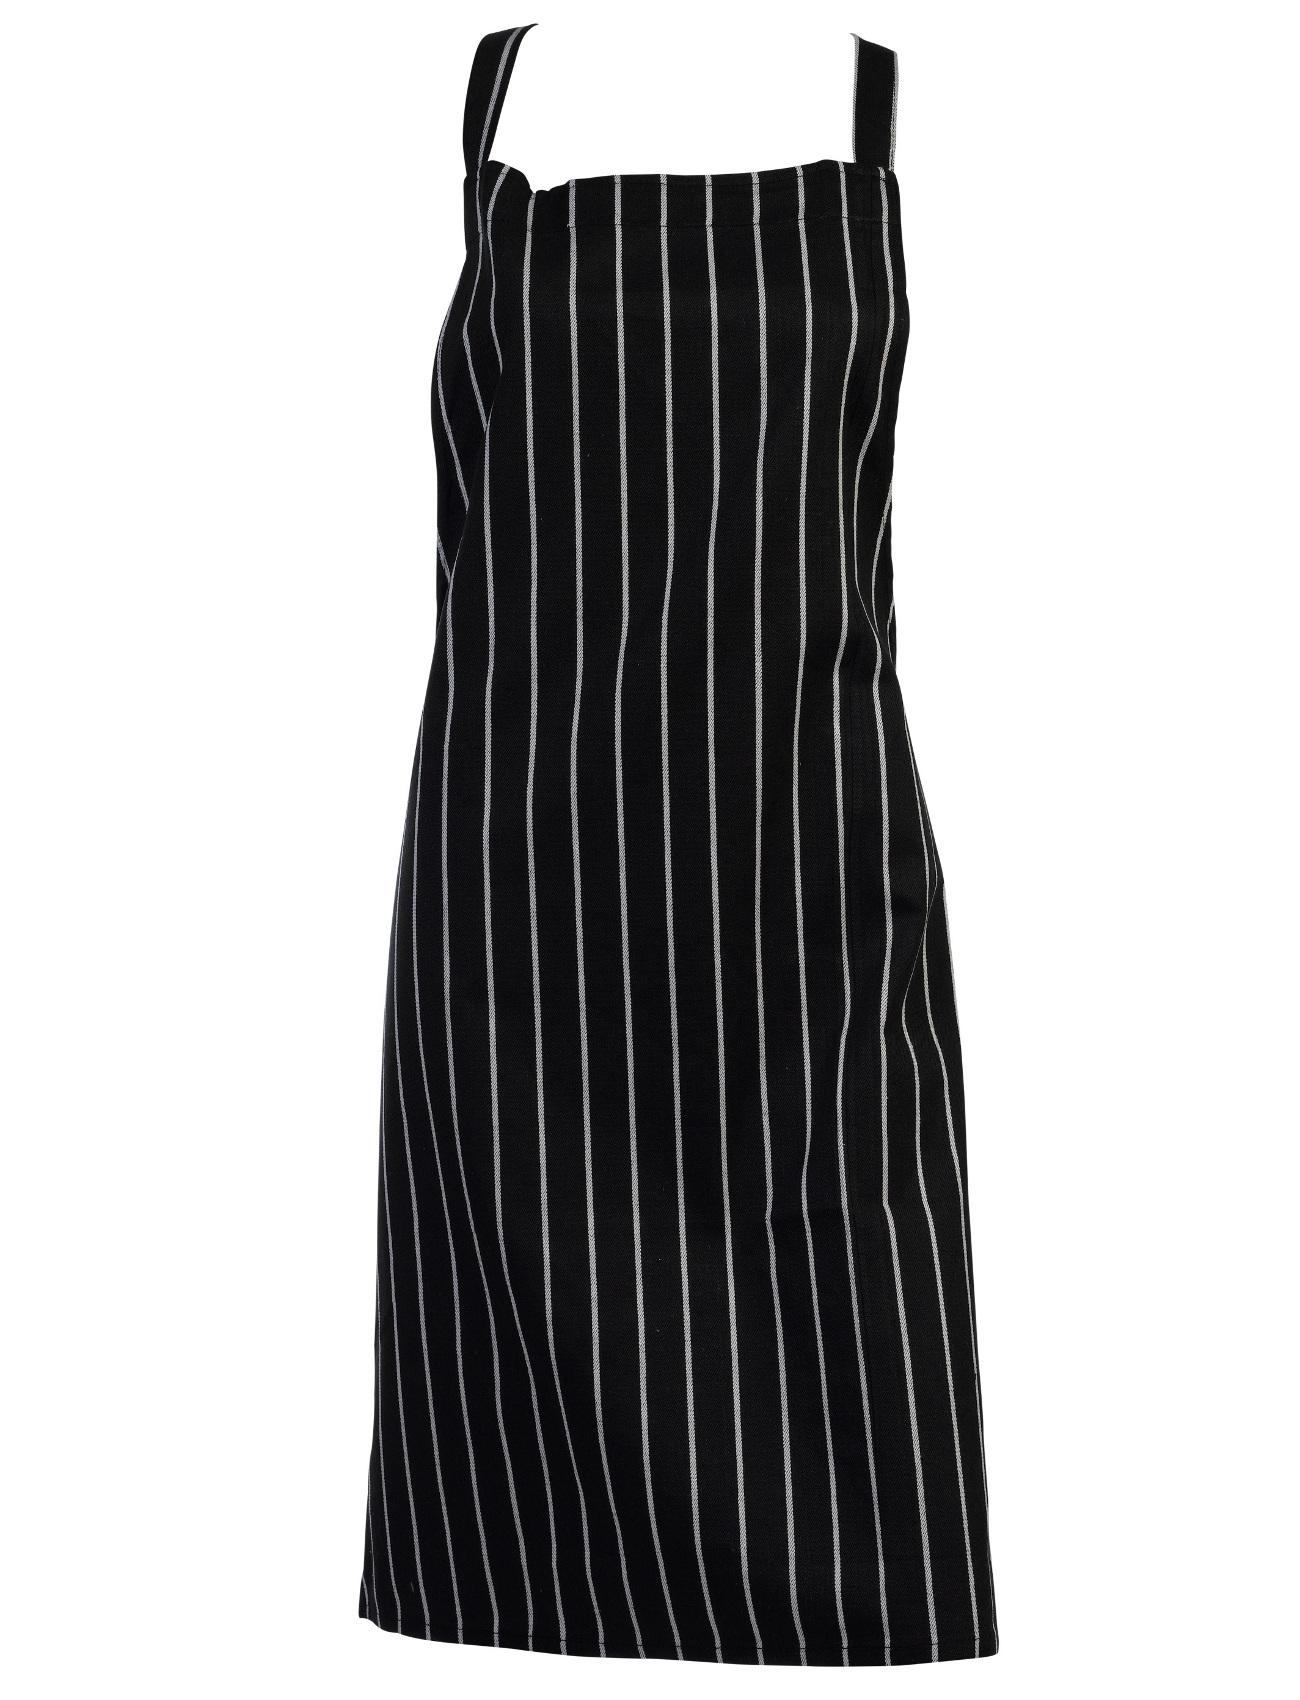 White apron ebay.ca - 100 Cotton Woven Stripe Butchers Bib Apron Cooks